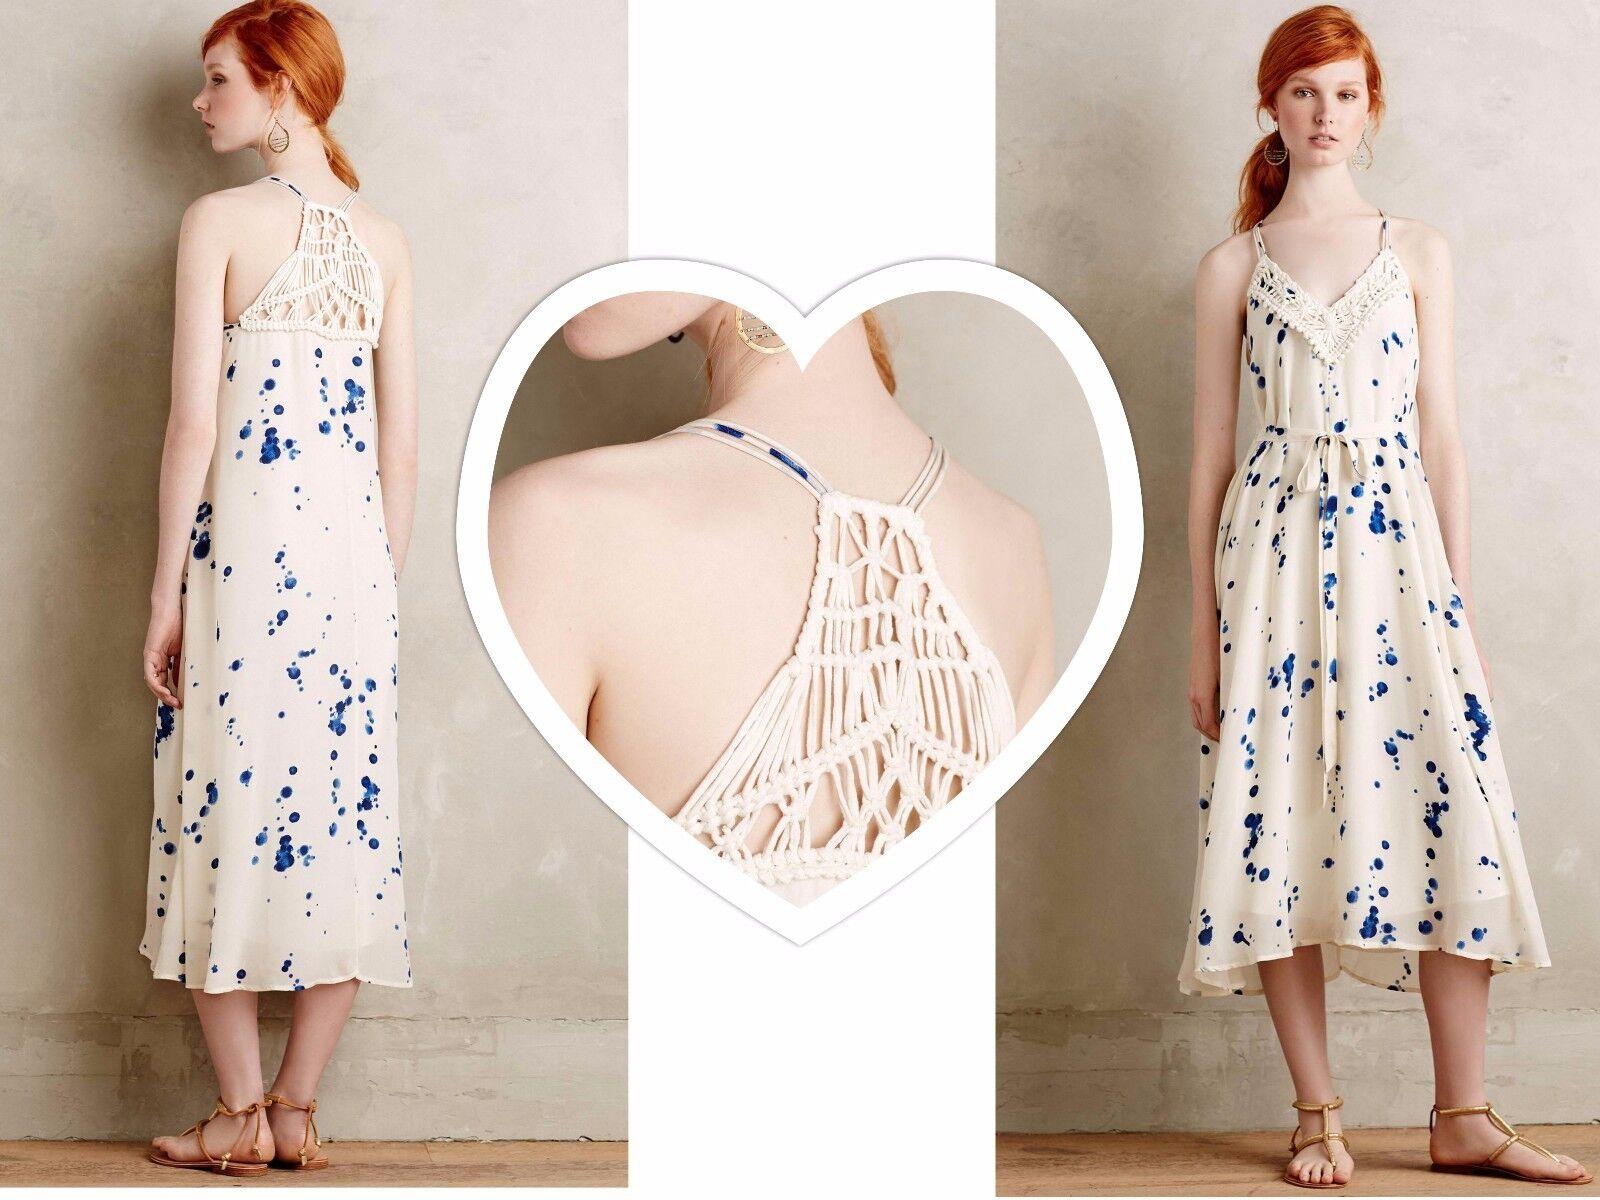 NWT Anthropologie Inkdrop Midi Dress by Maeve, SP, M, L, Crochet Back,